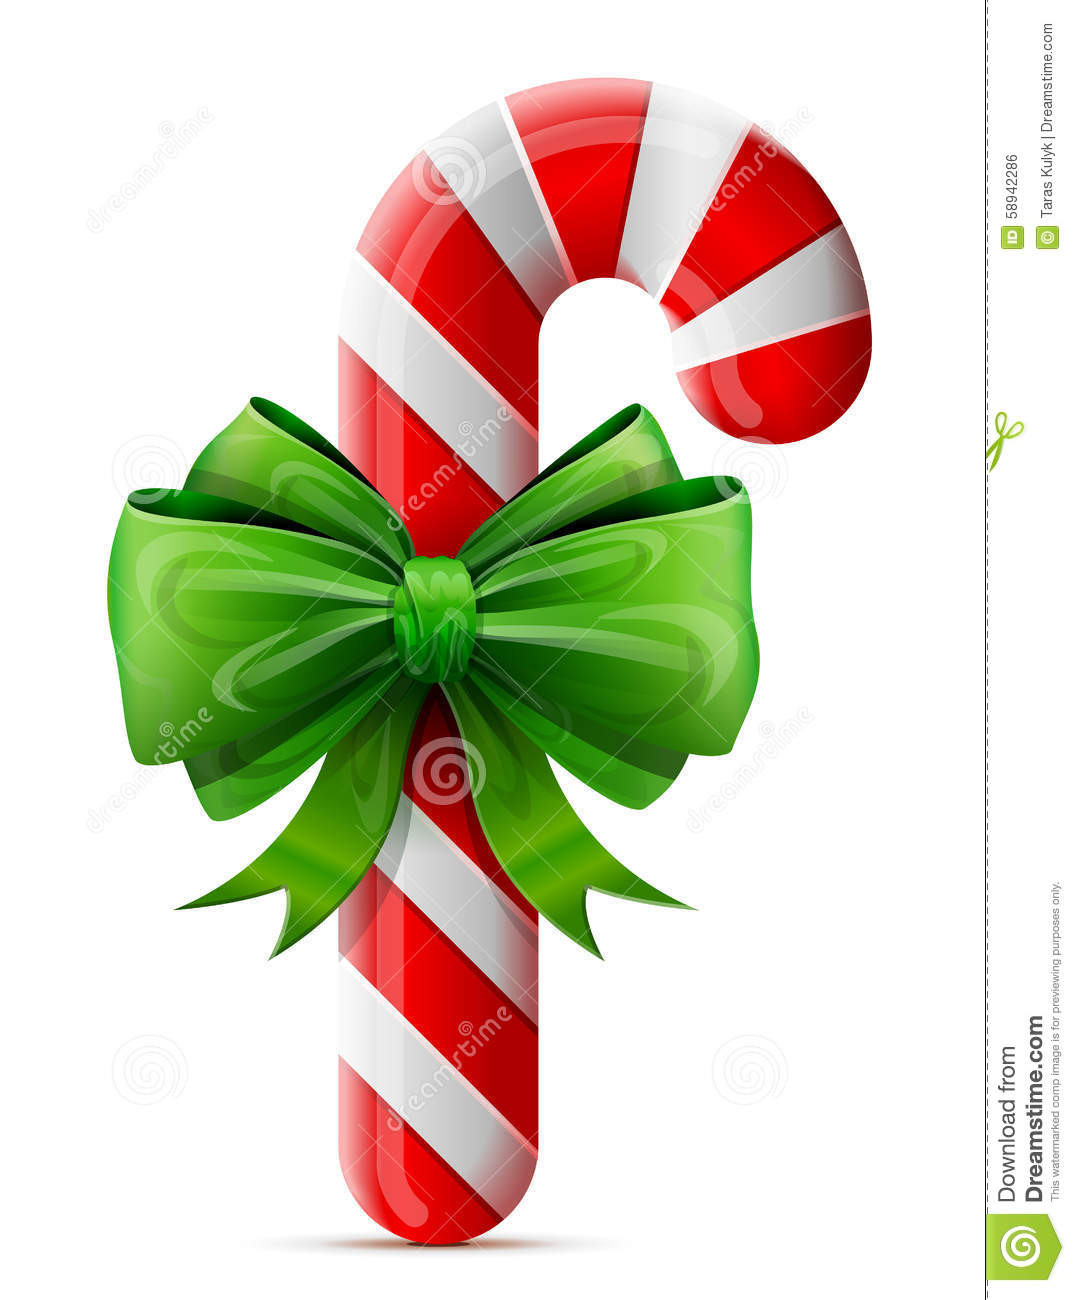 Christmas Candy Sticks  New Year Celebration Christmas Holiday Stuff Stock